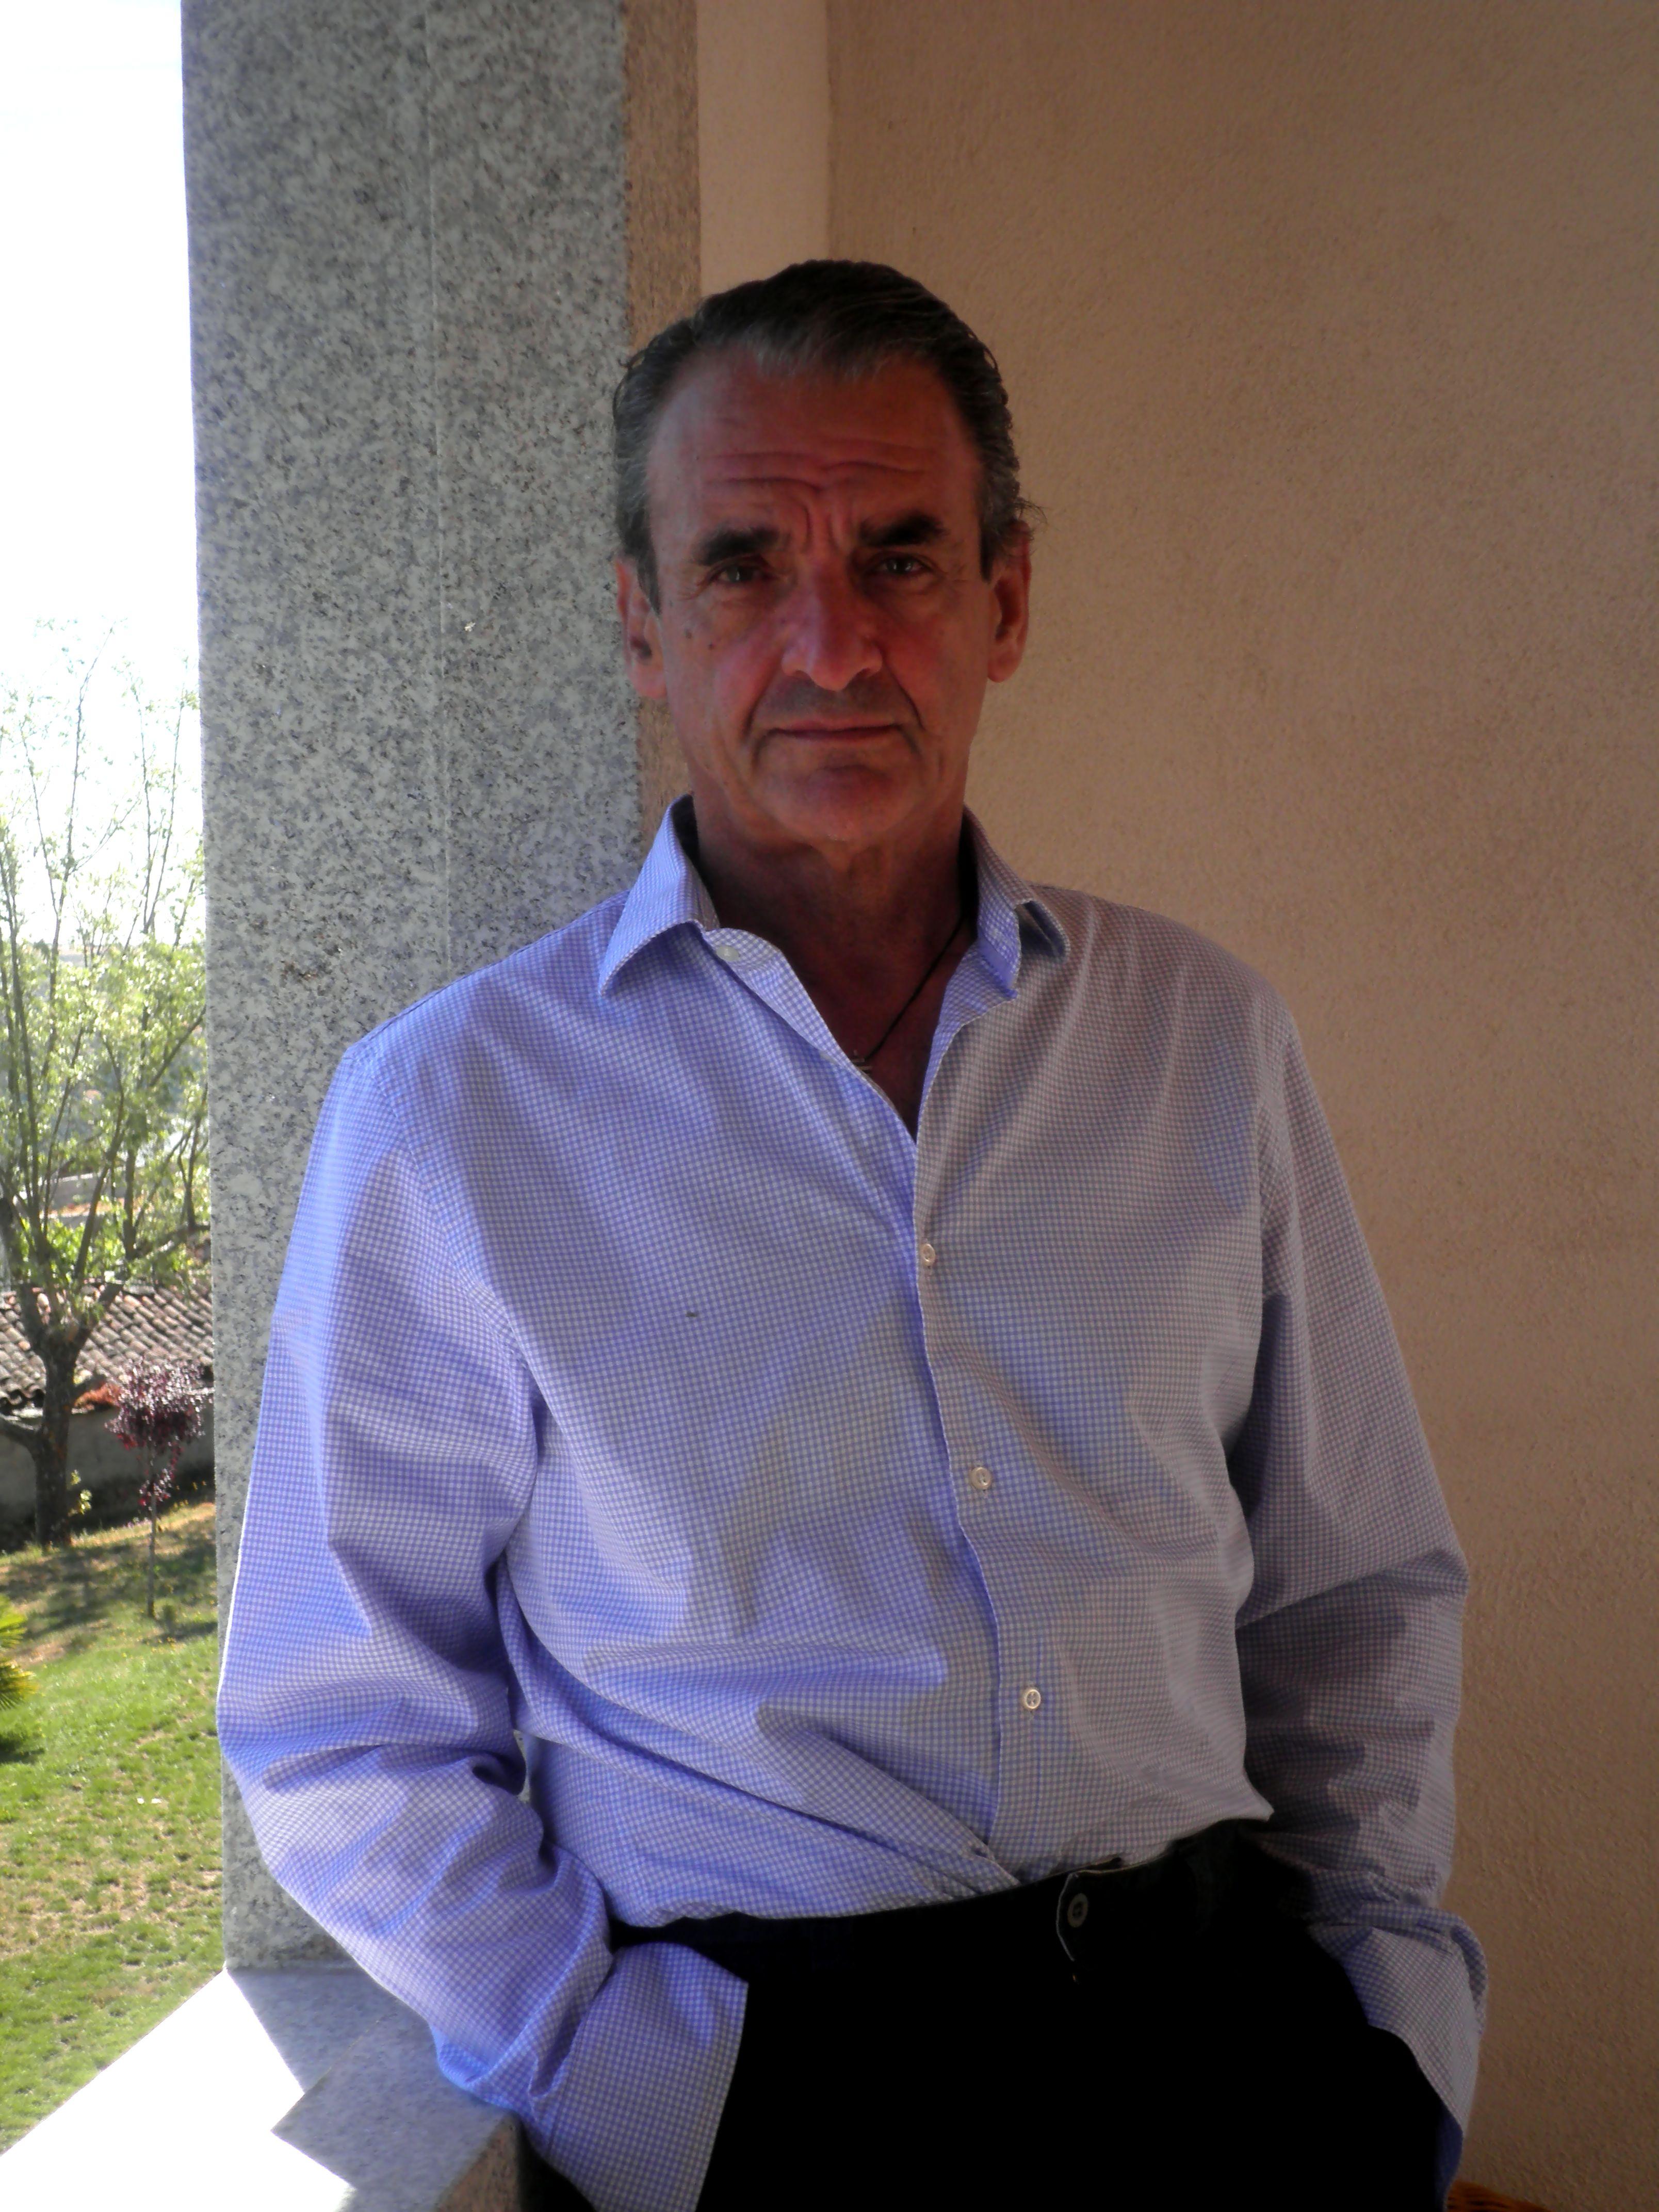 Mario Conde na Casa Grande da Cerca (Chauazoso) | Foto: Iván Olmos